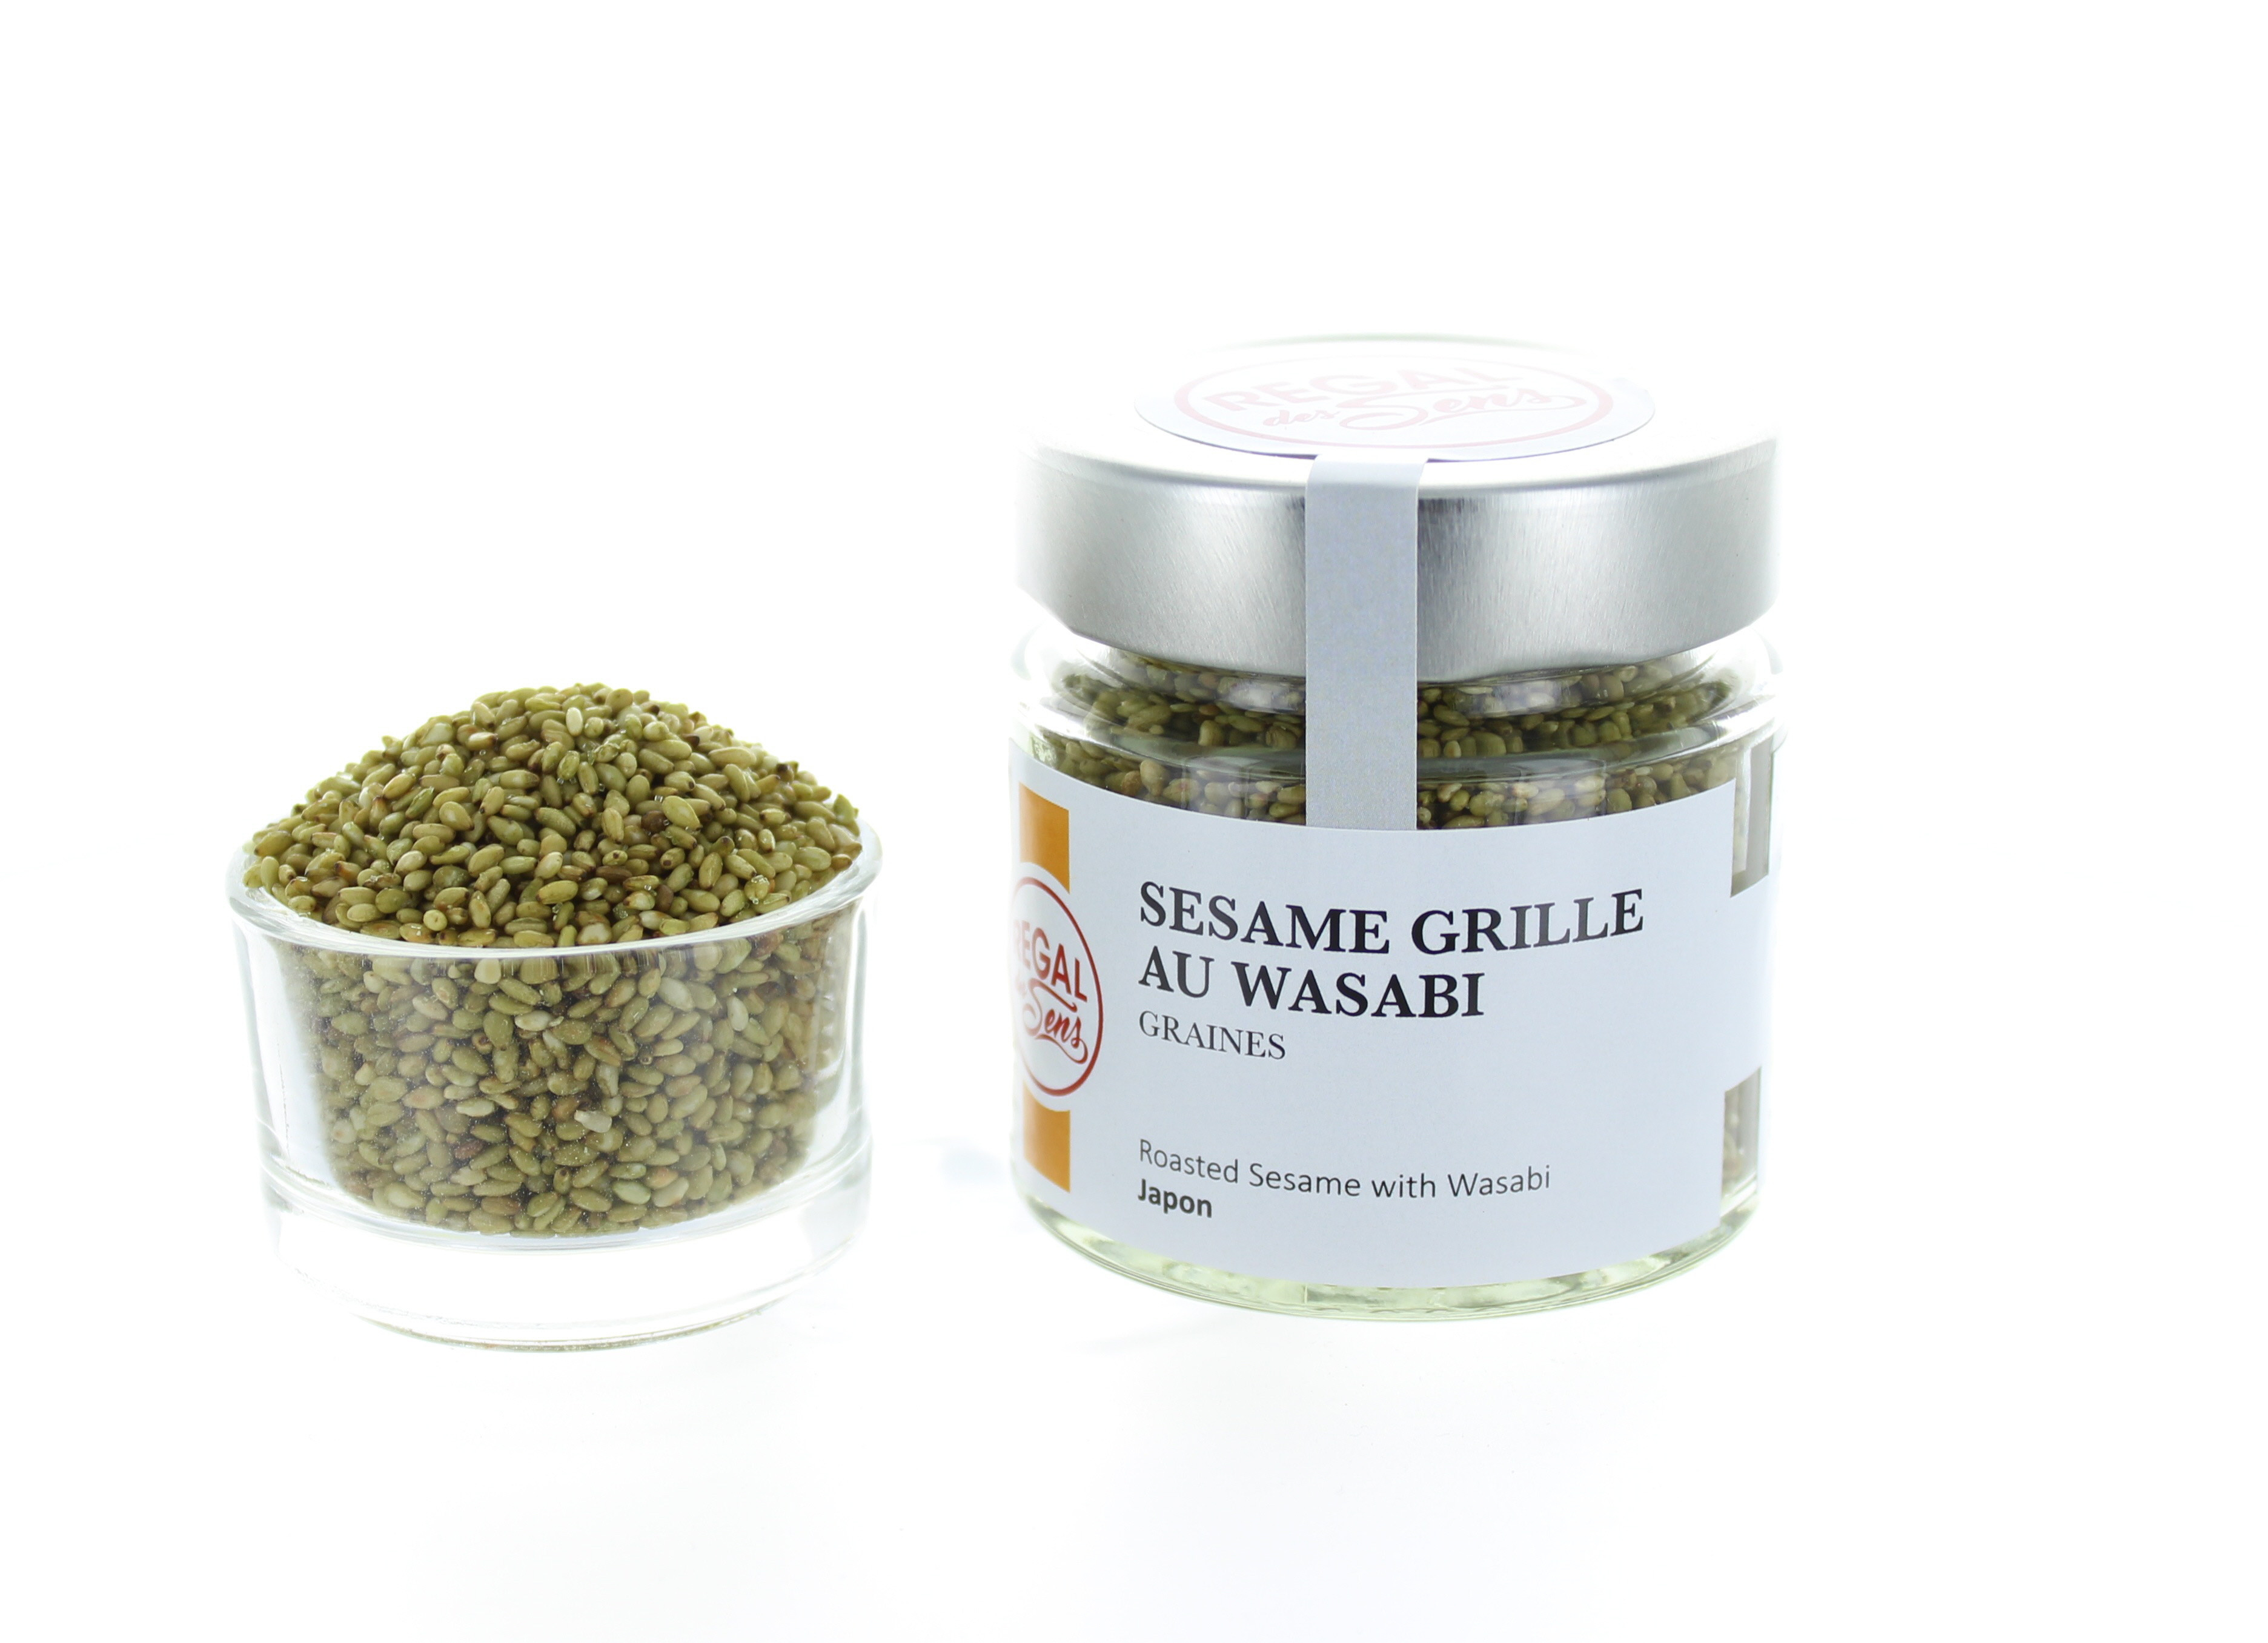 Sésame grillé au wasabi